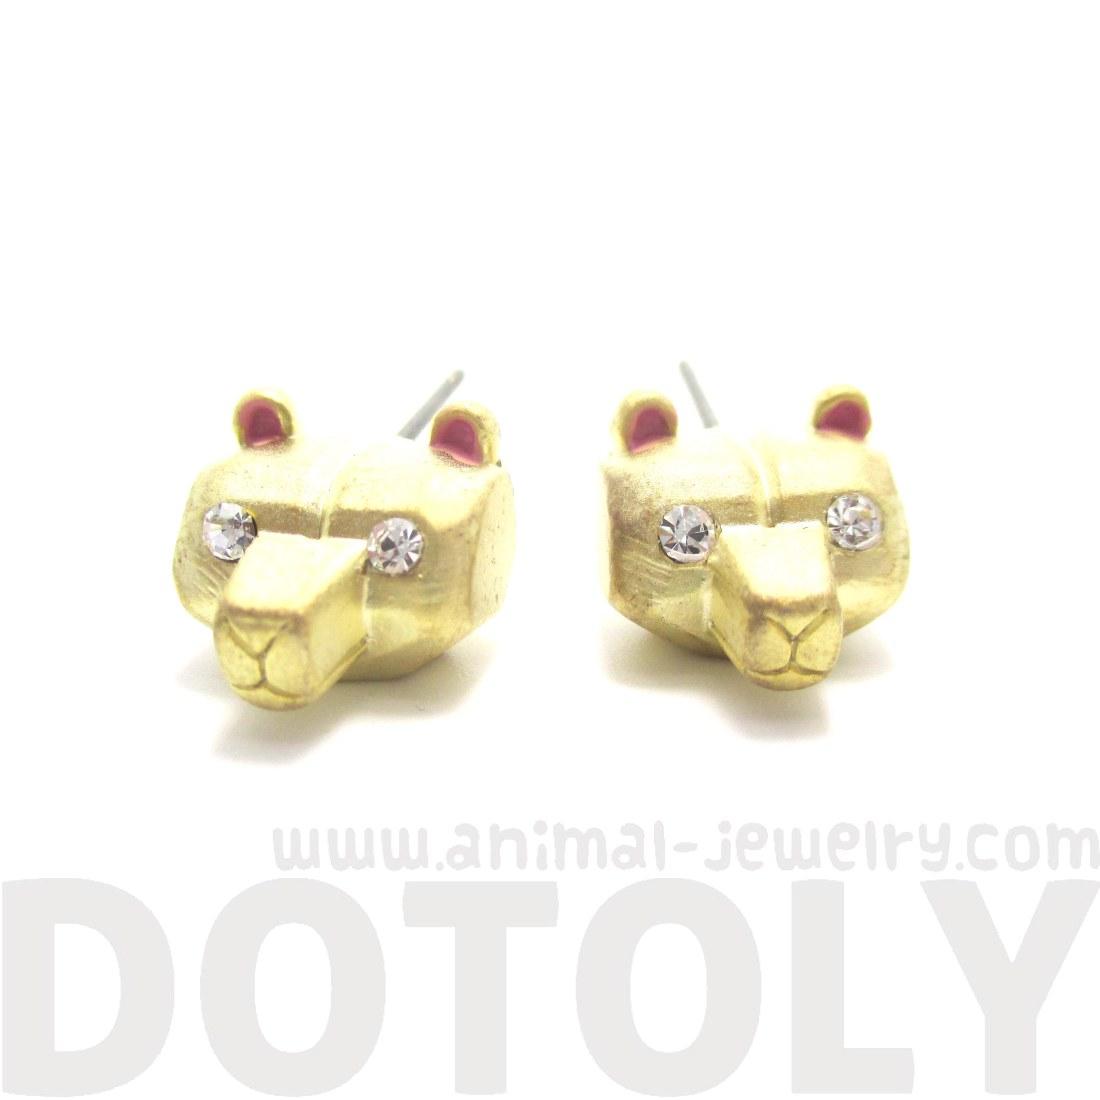 3D Super Cute Polar Bear Face Shaped Animal Stud Earrings in Gold ...